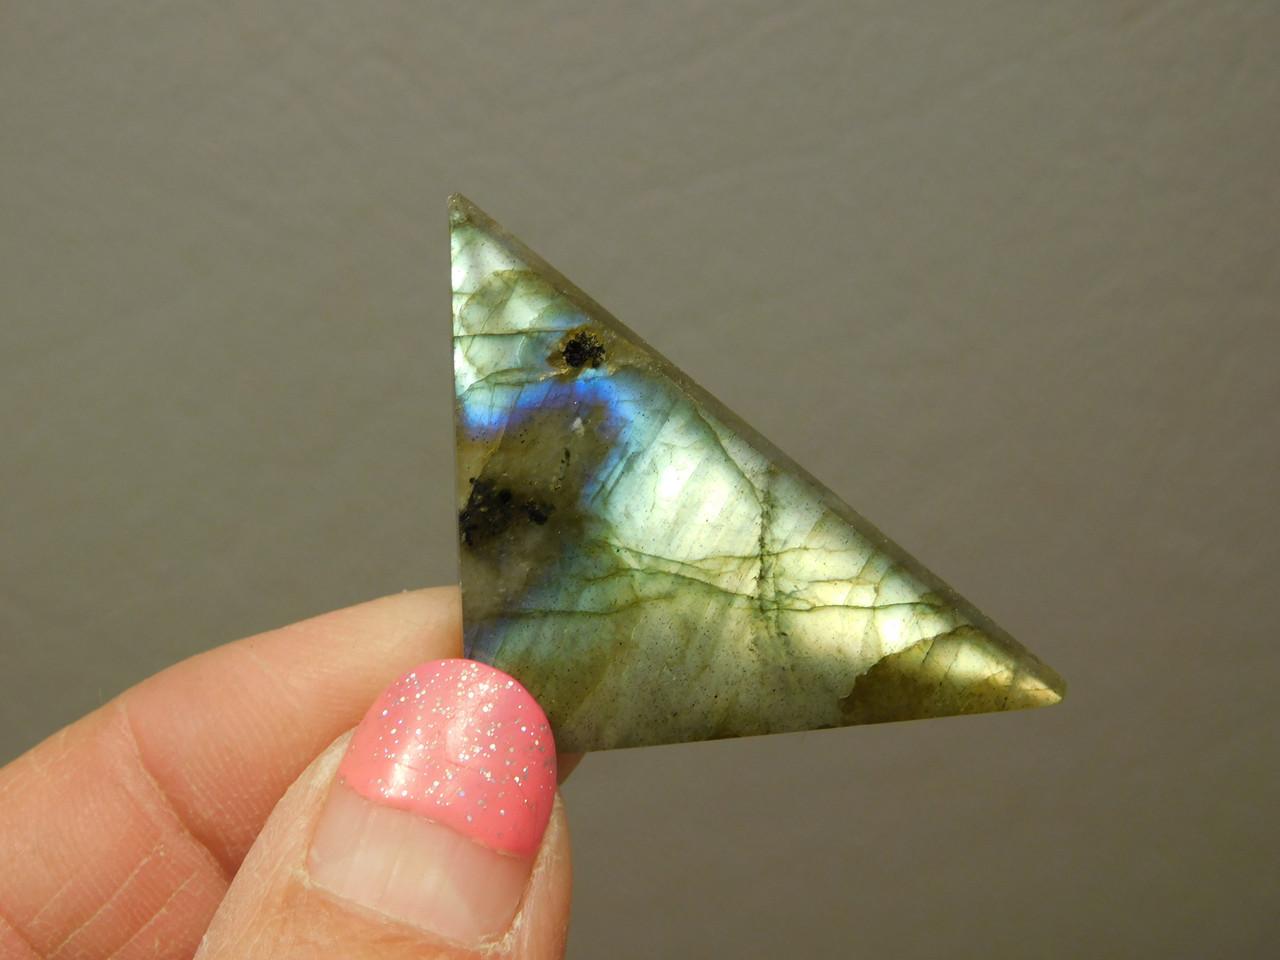 Rainbow Labradorite Cabochon Gemstone Triangle Stone #6